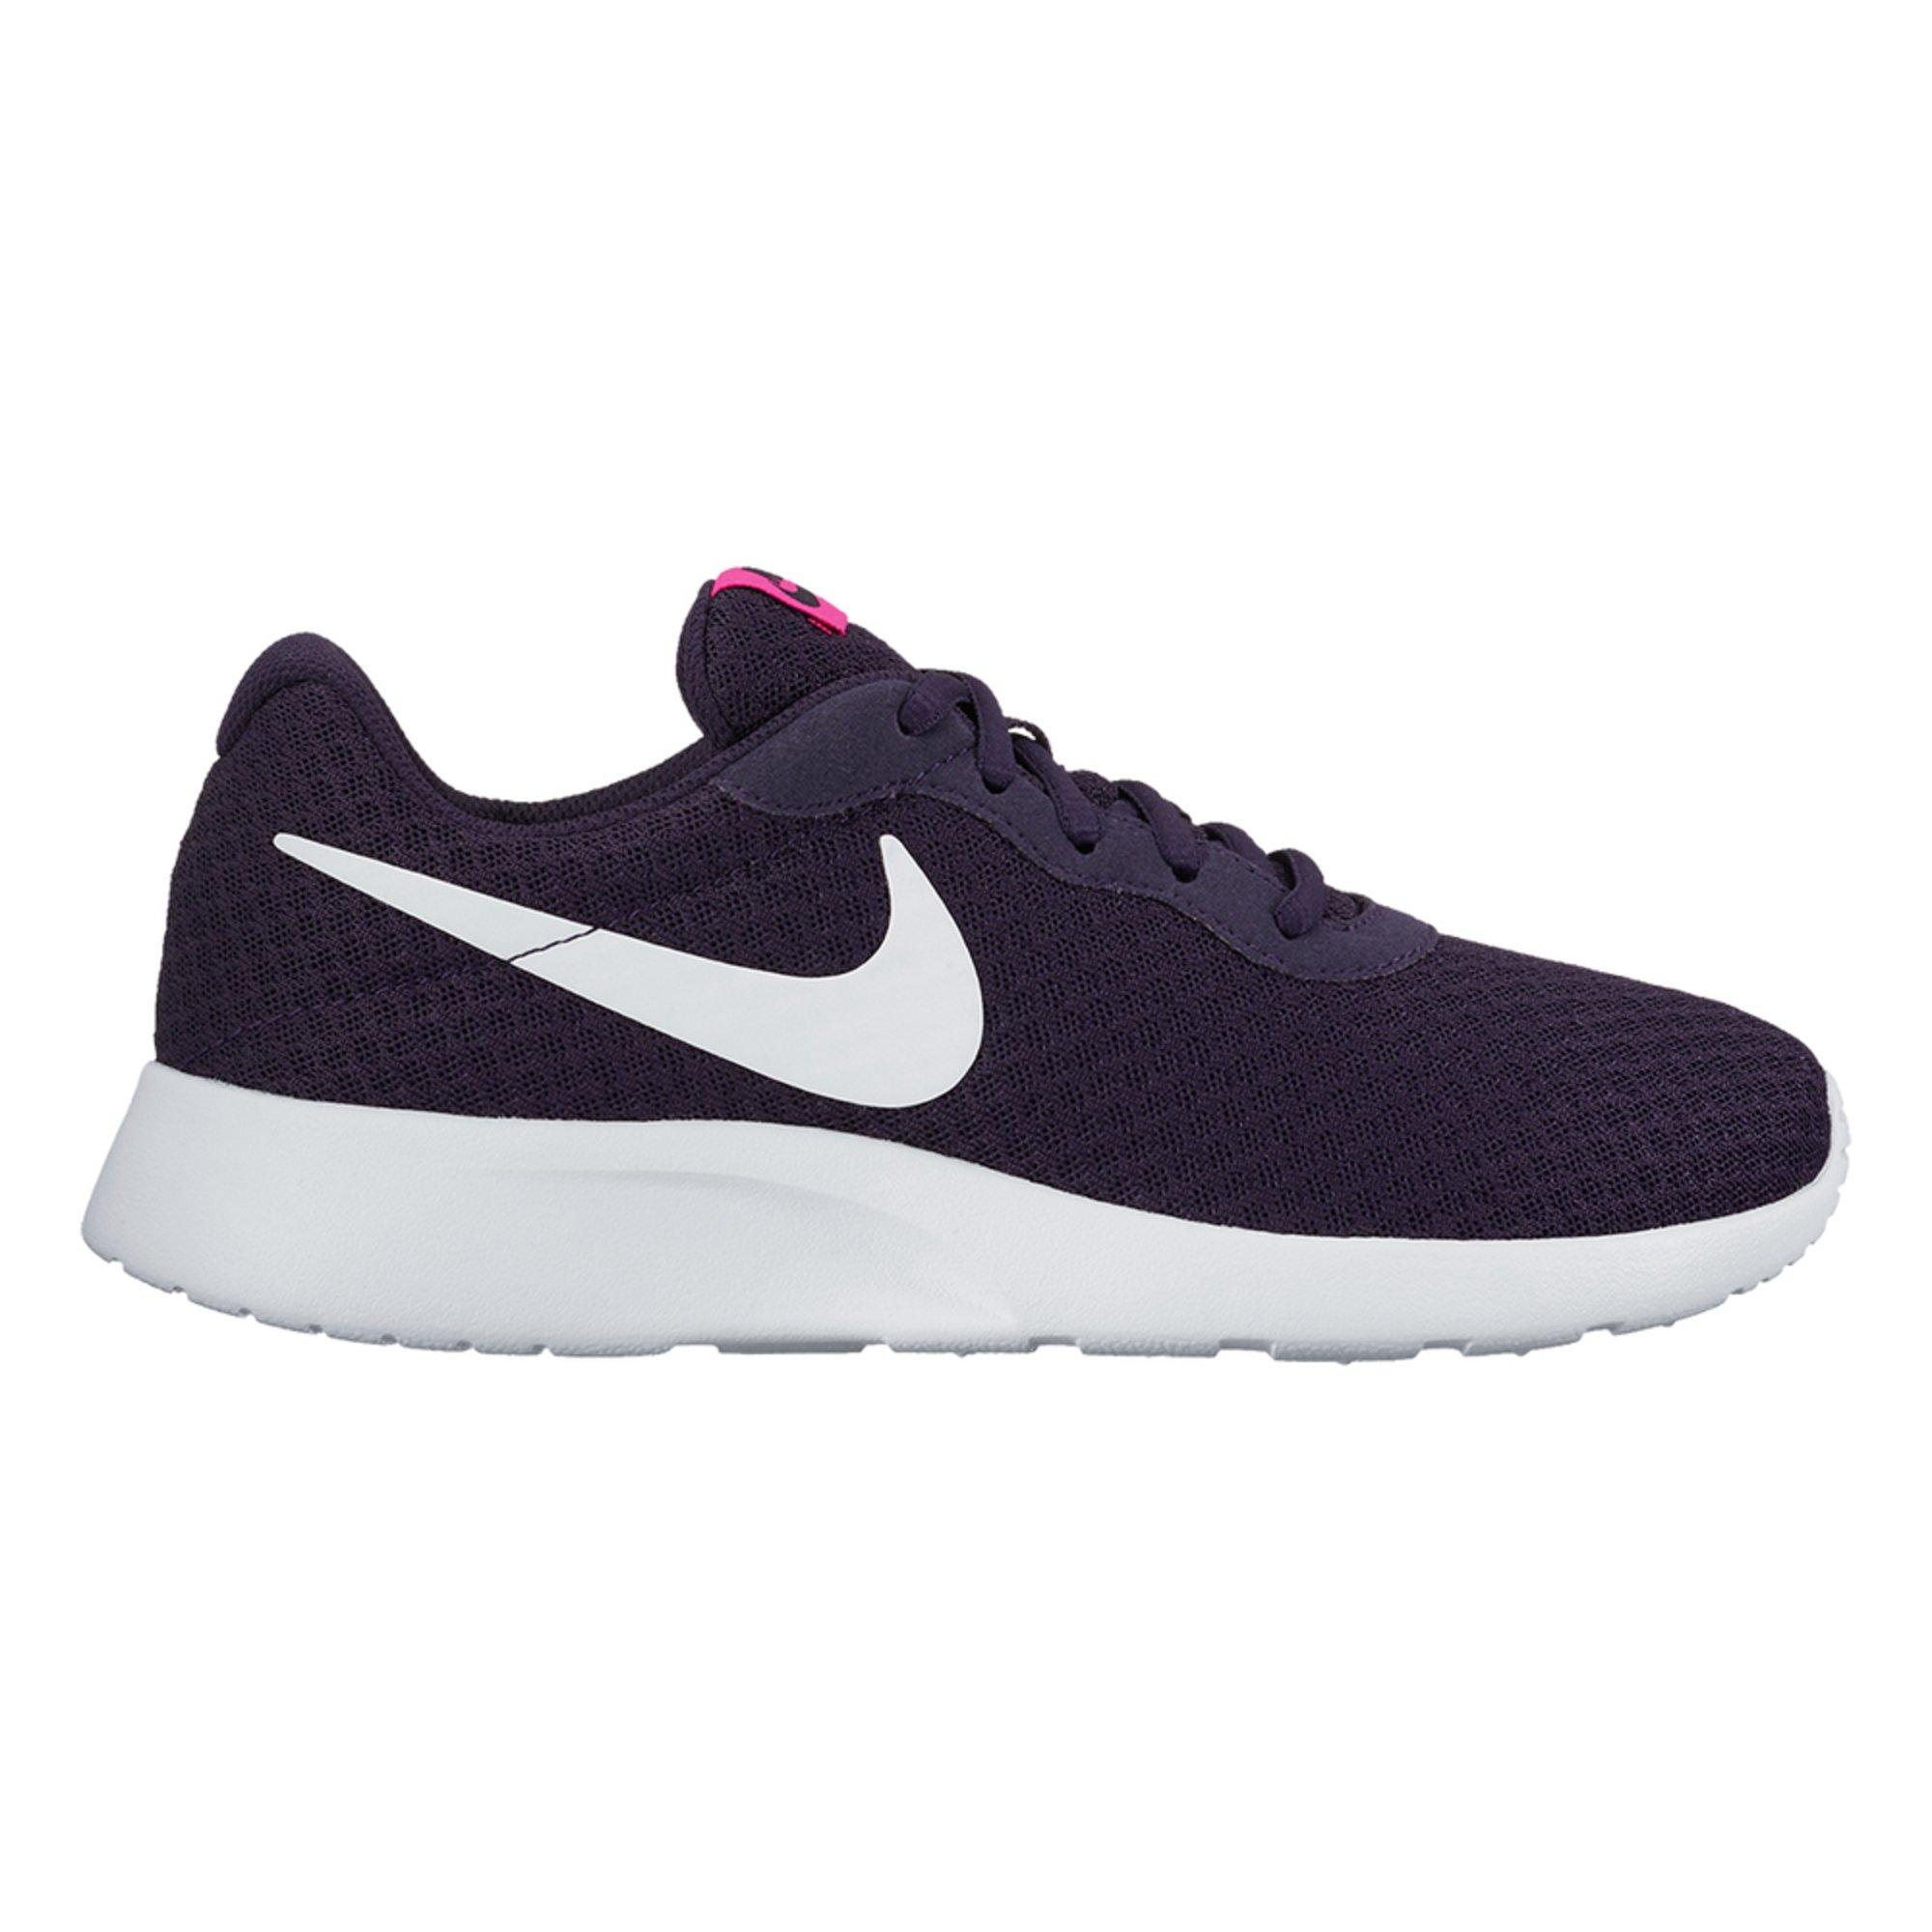 Nike Tanjun Women S Athletic Shoes Care